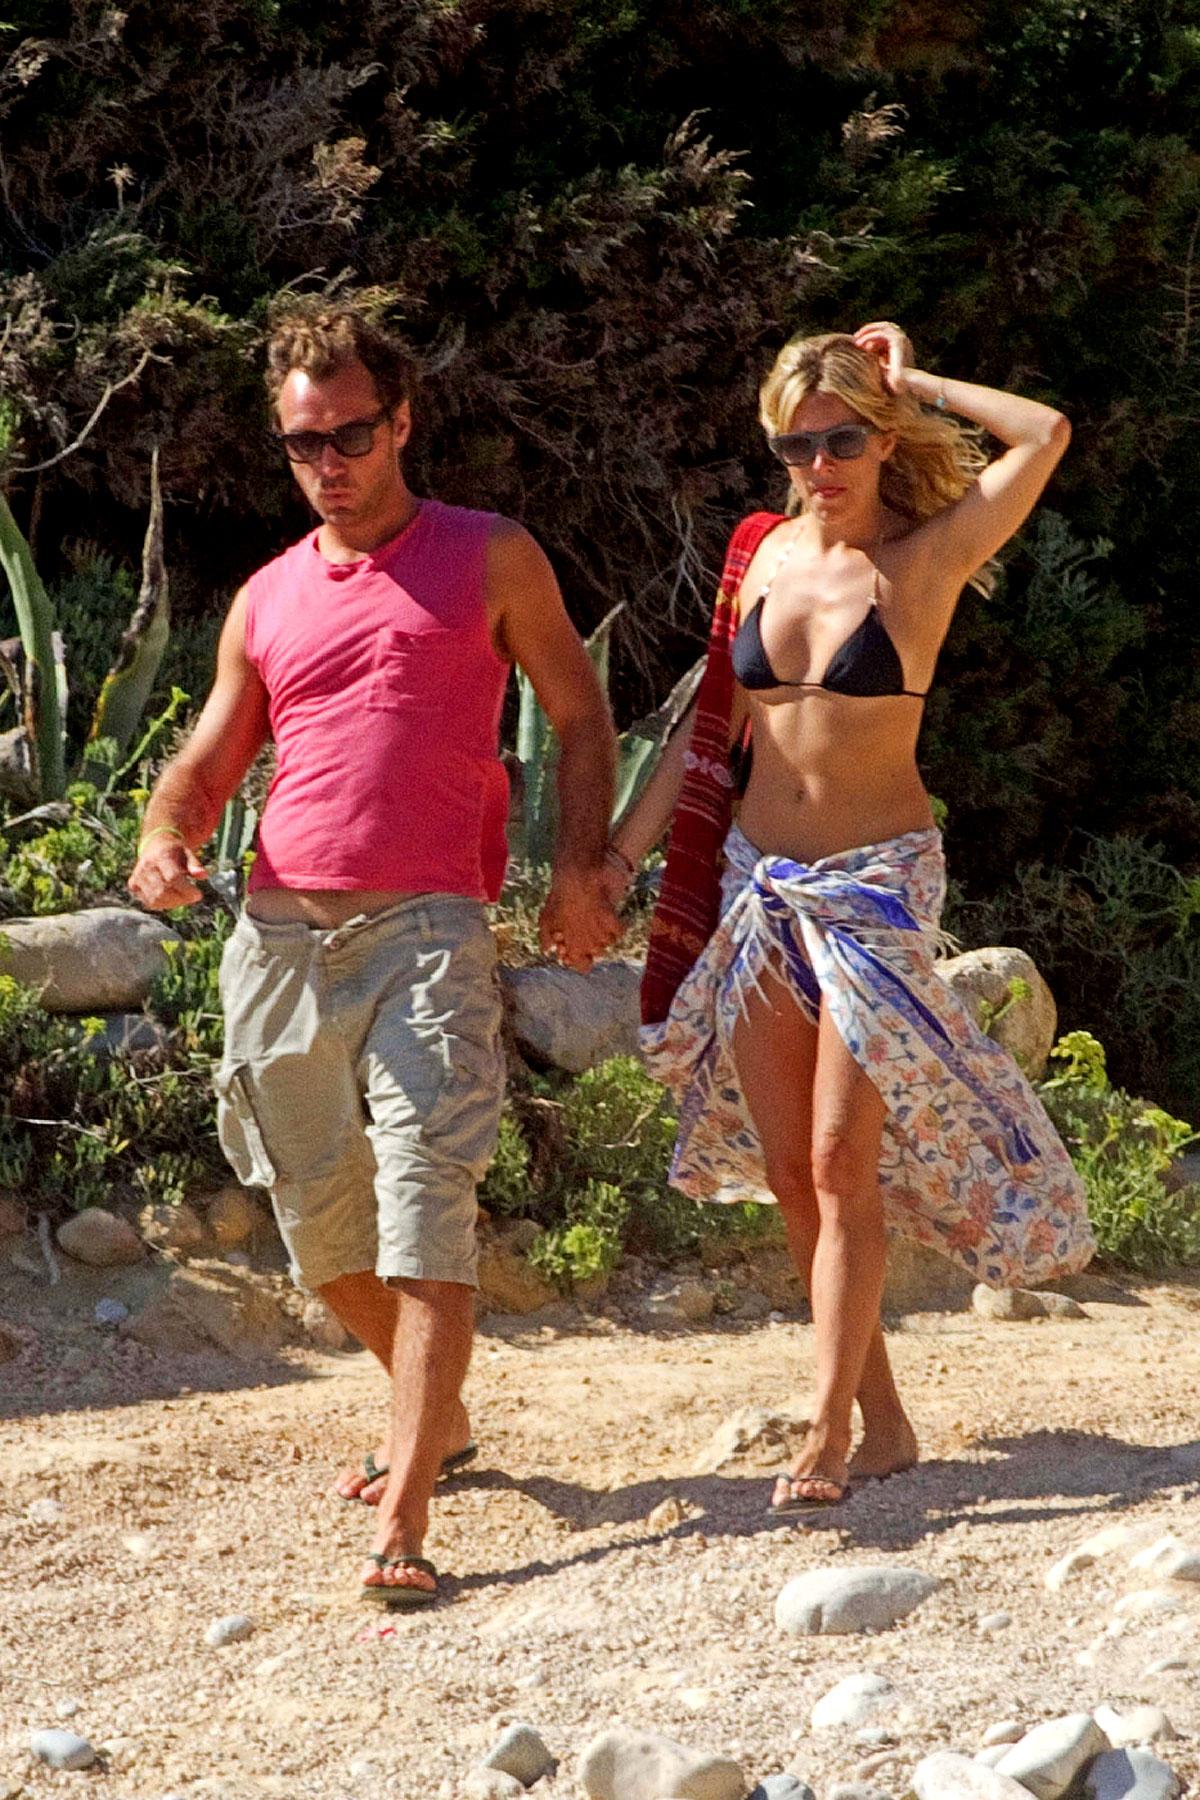 Jude Law & Bikini-Rocking Sienna Miller Vacation in Ibiza (PHOTOS)